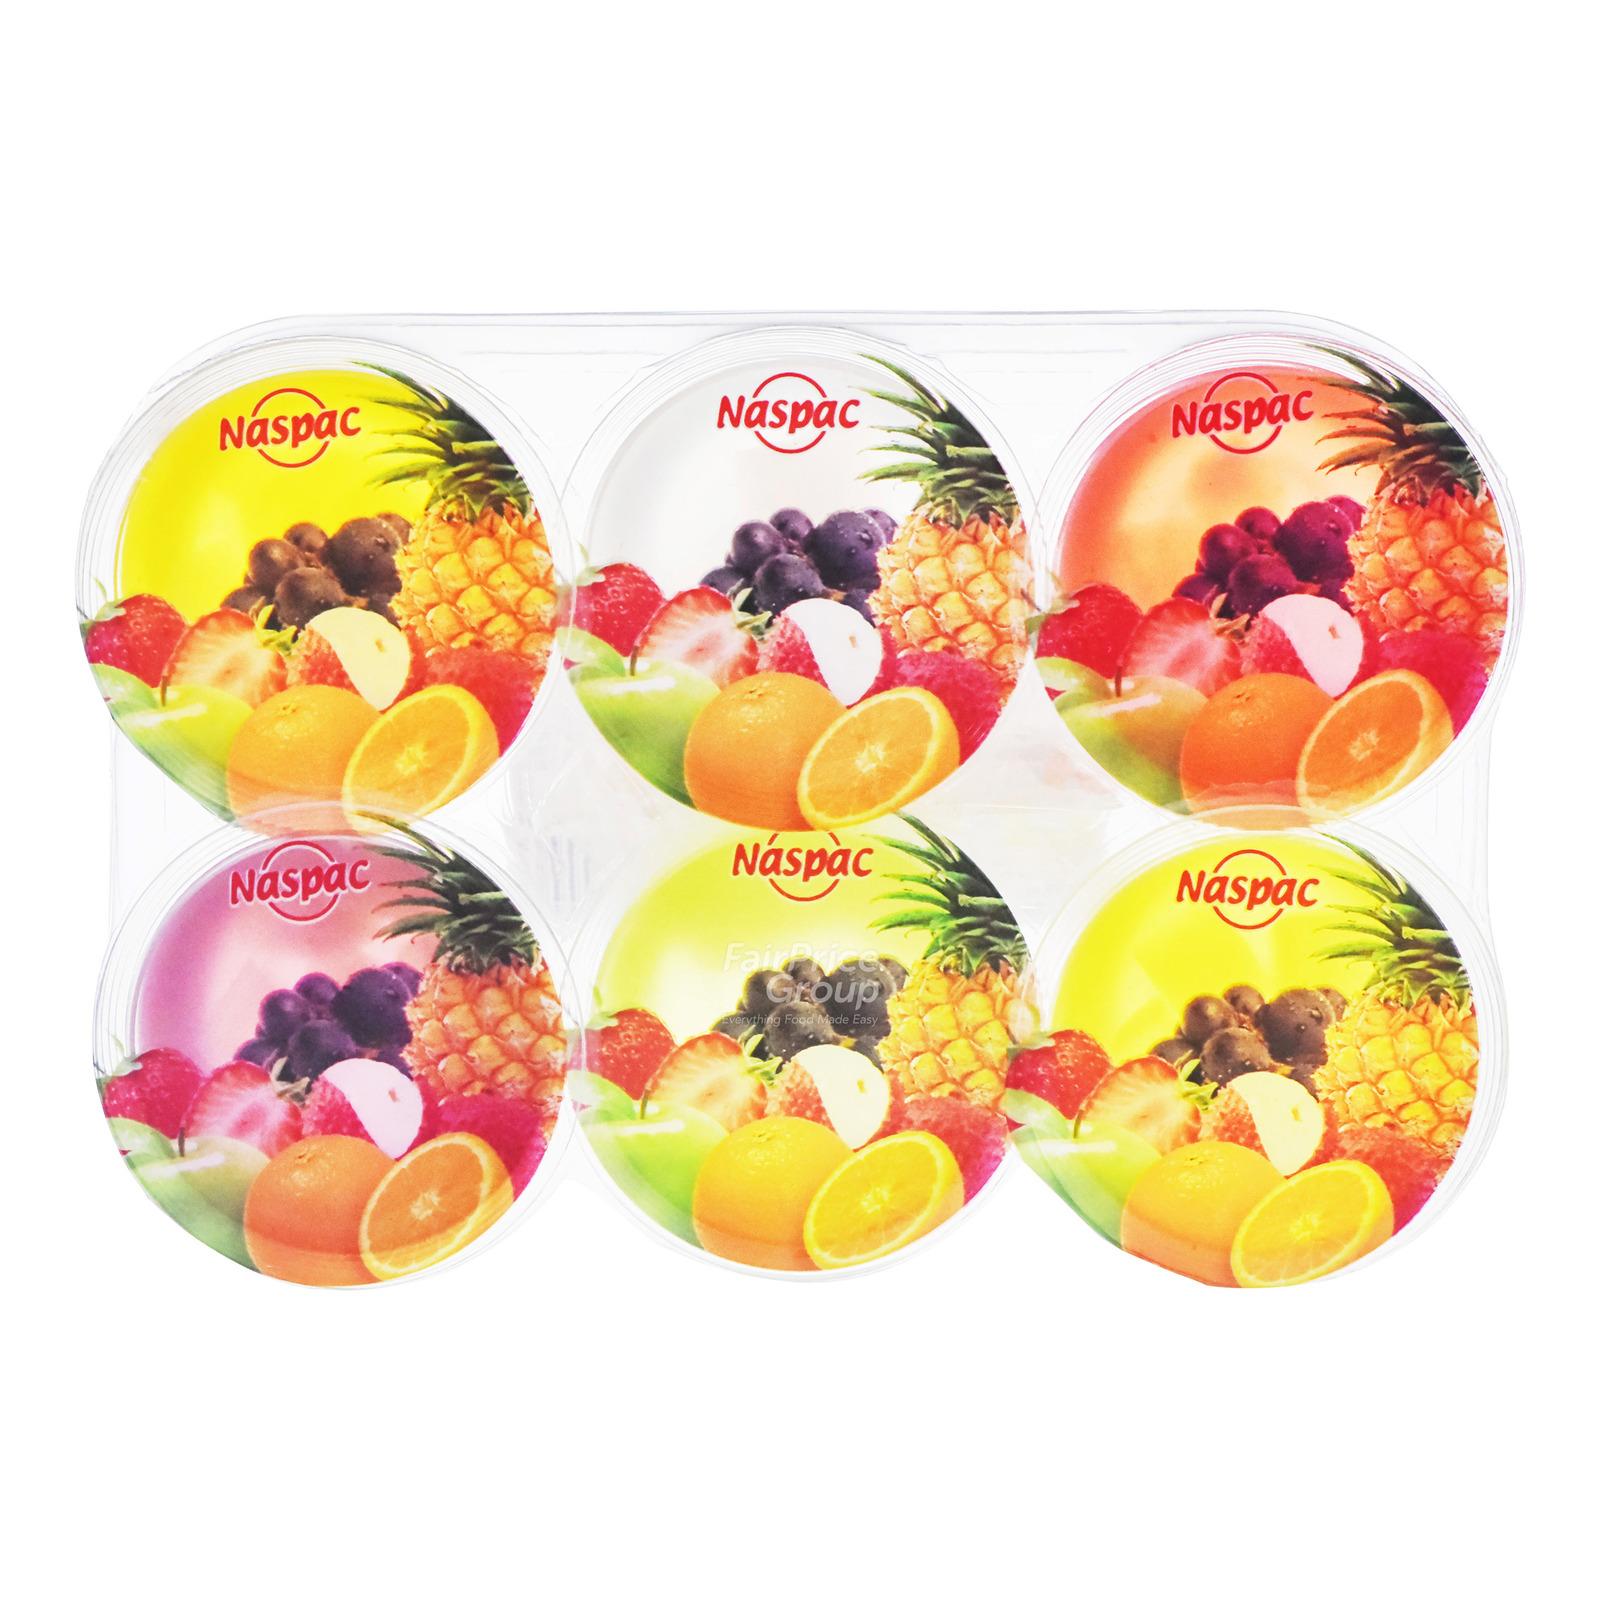 Naspac Jelly with Nata De Coco Cup - Mixed Fruit